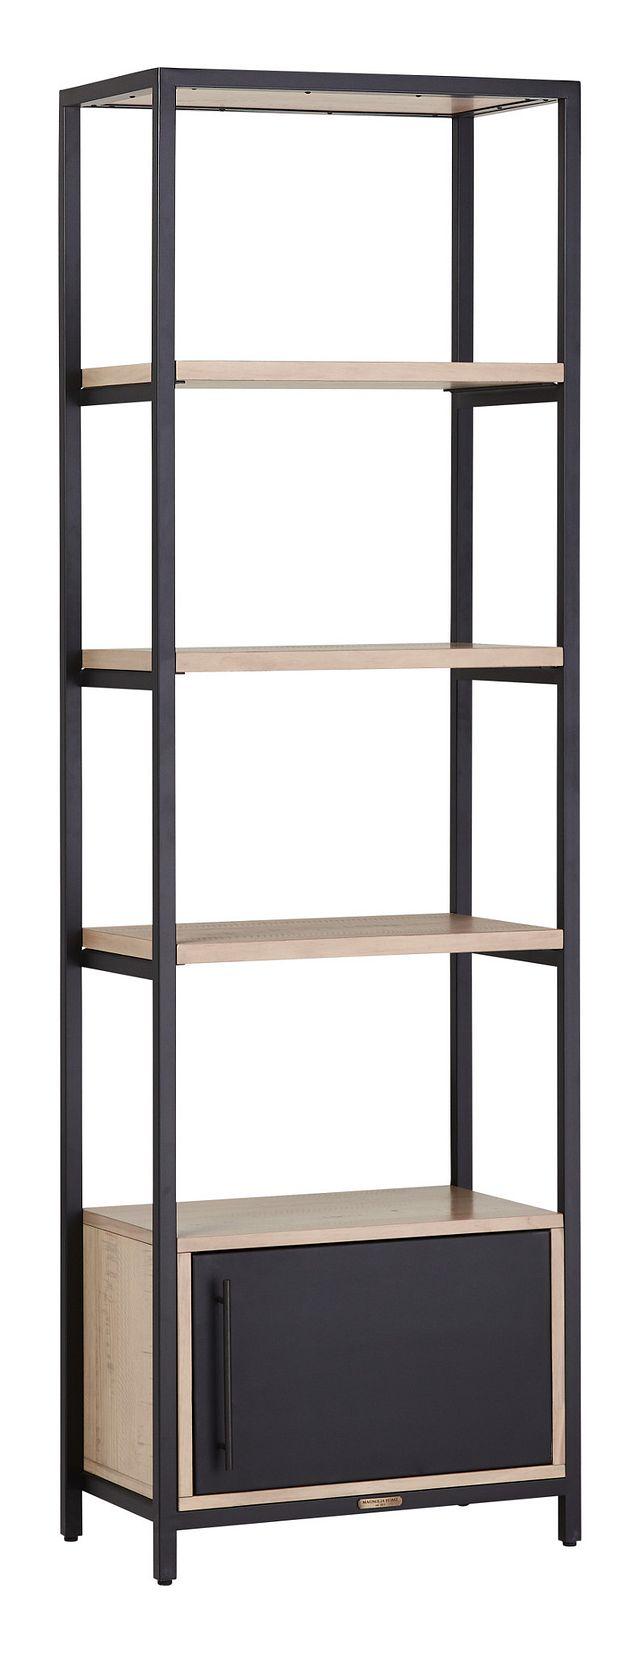 "Elemental 24"" Shelf (1)"